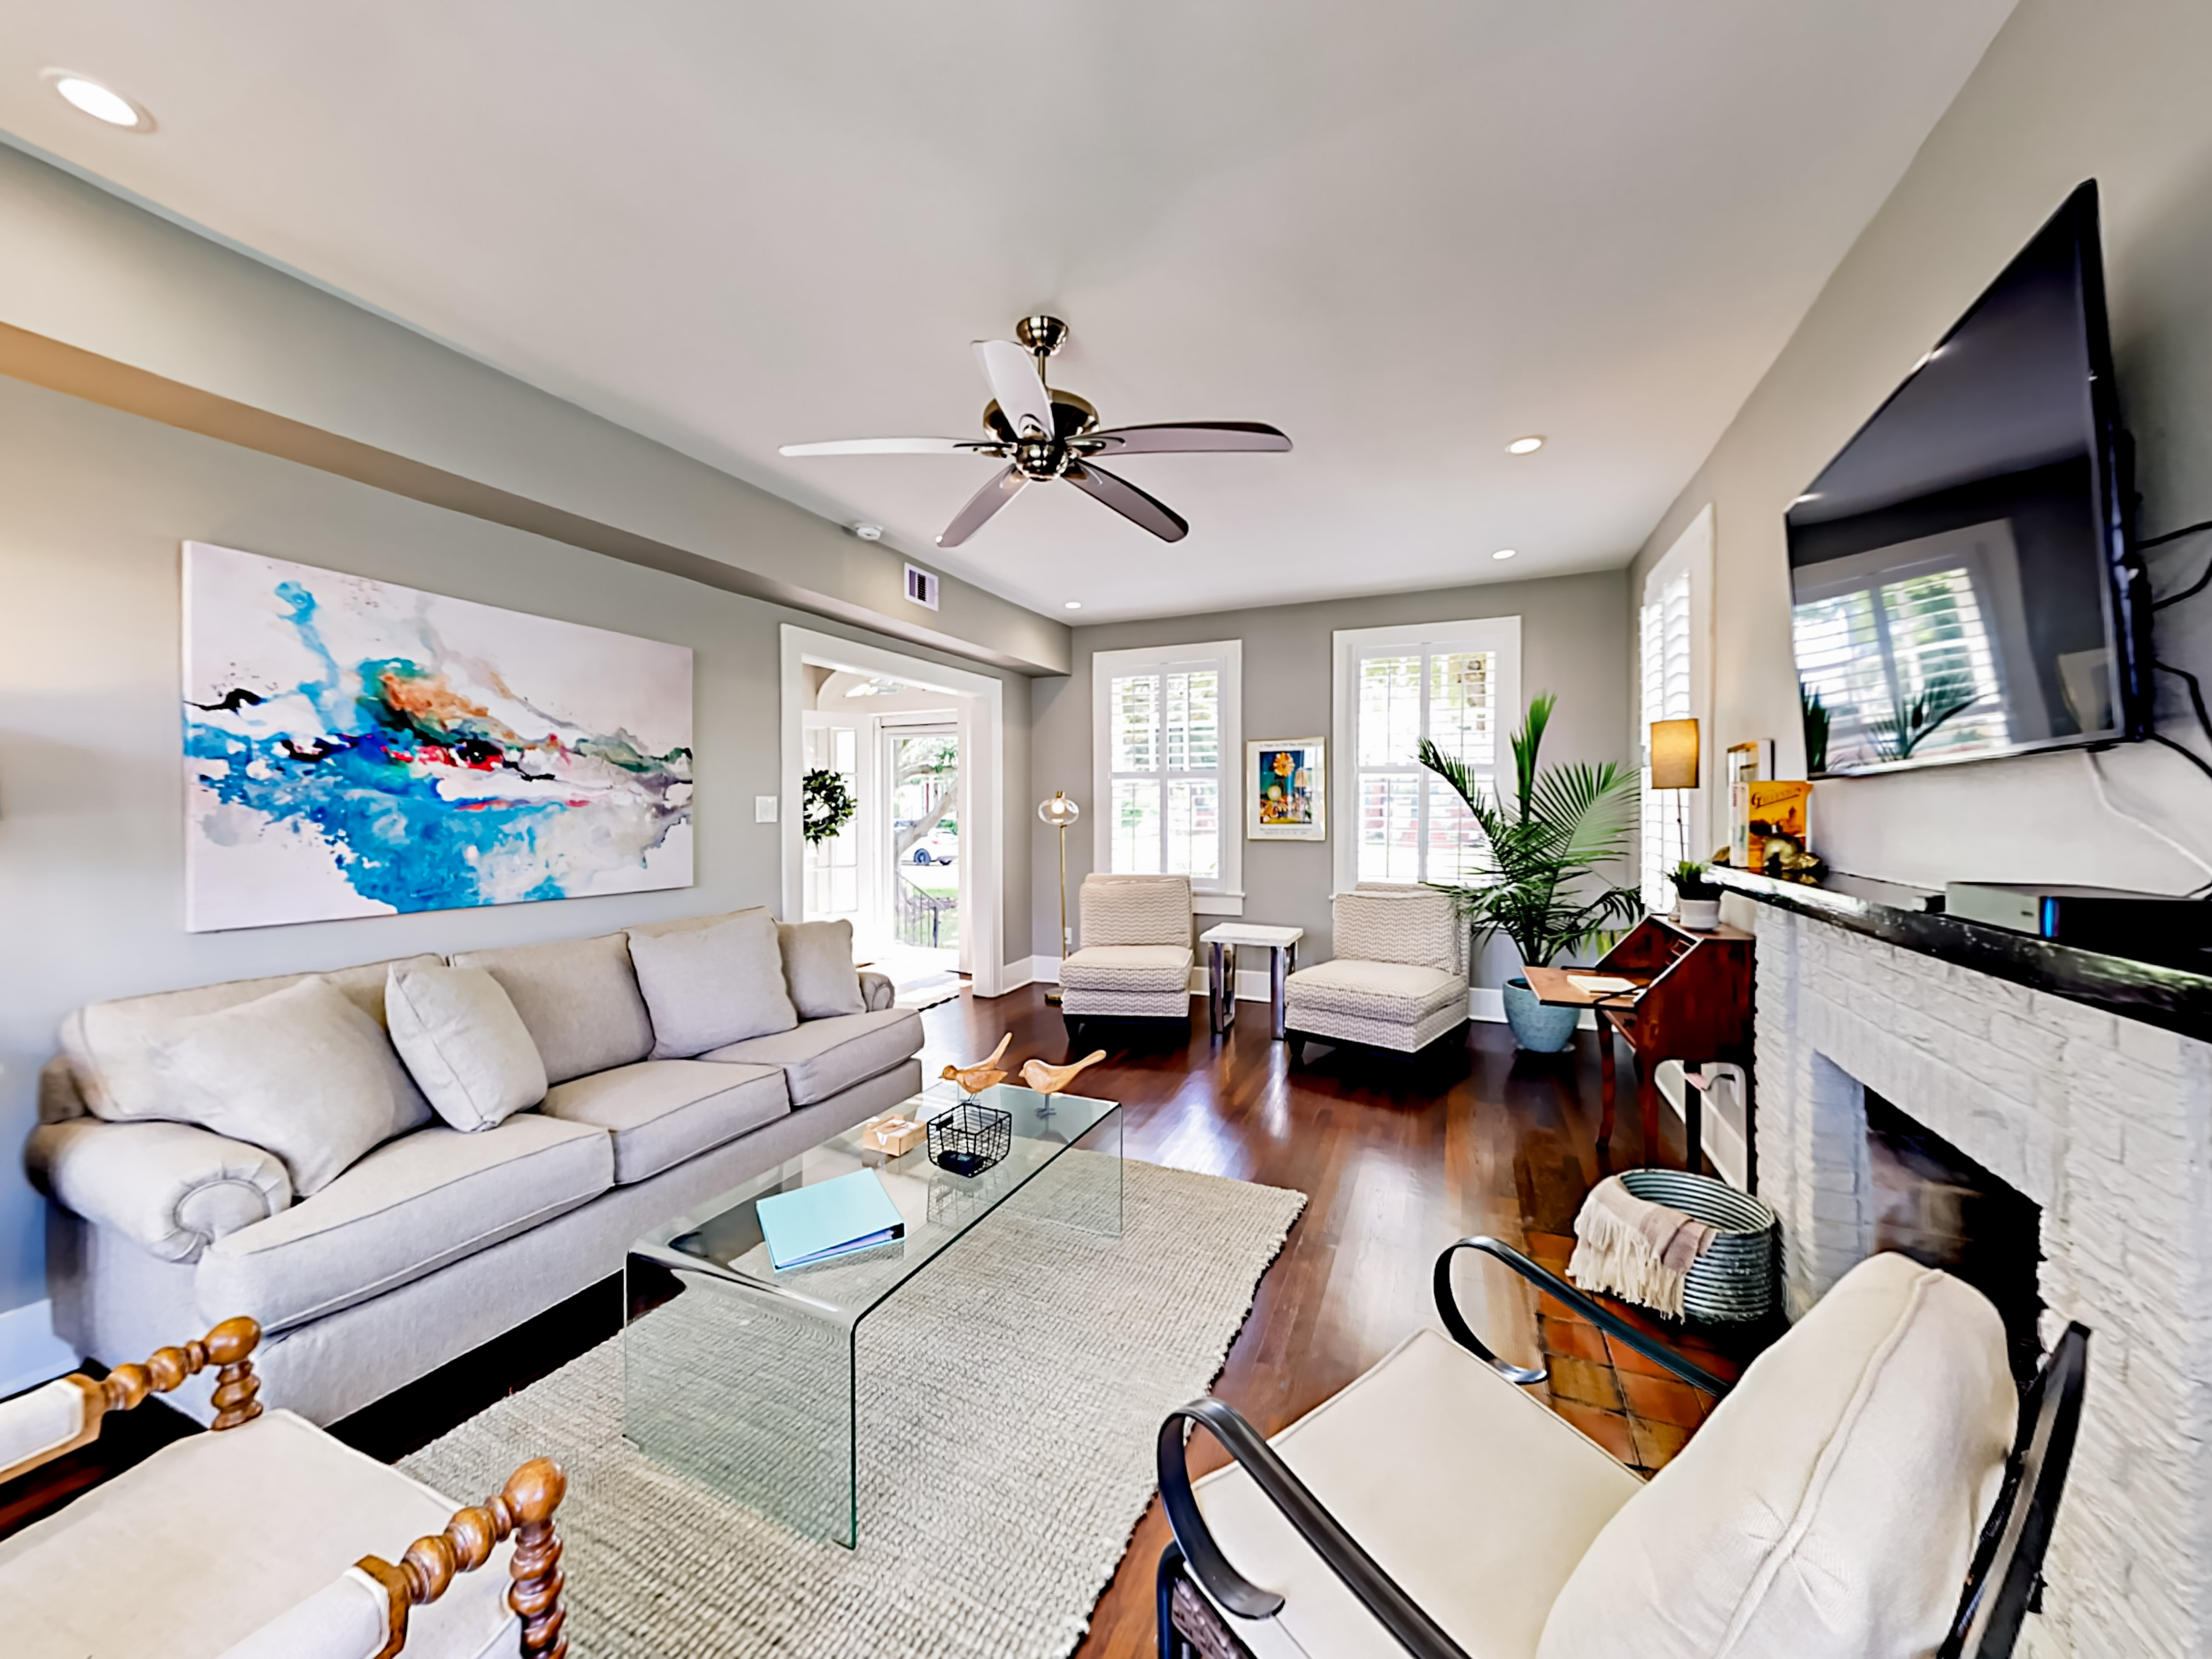 Galveston TX Vacation Rental The living room